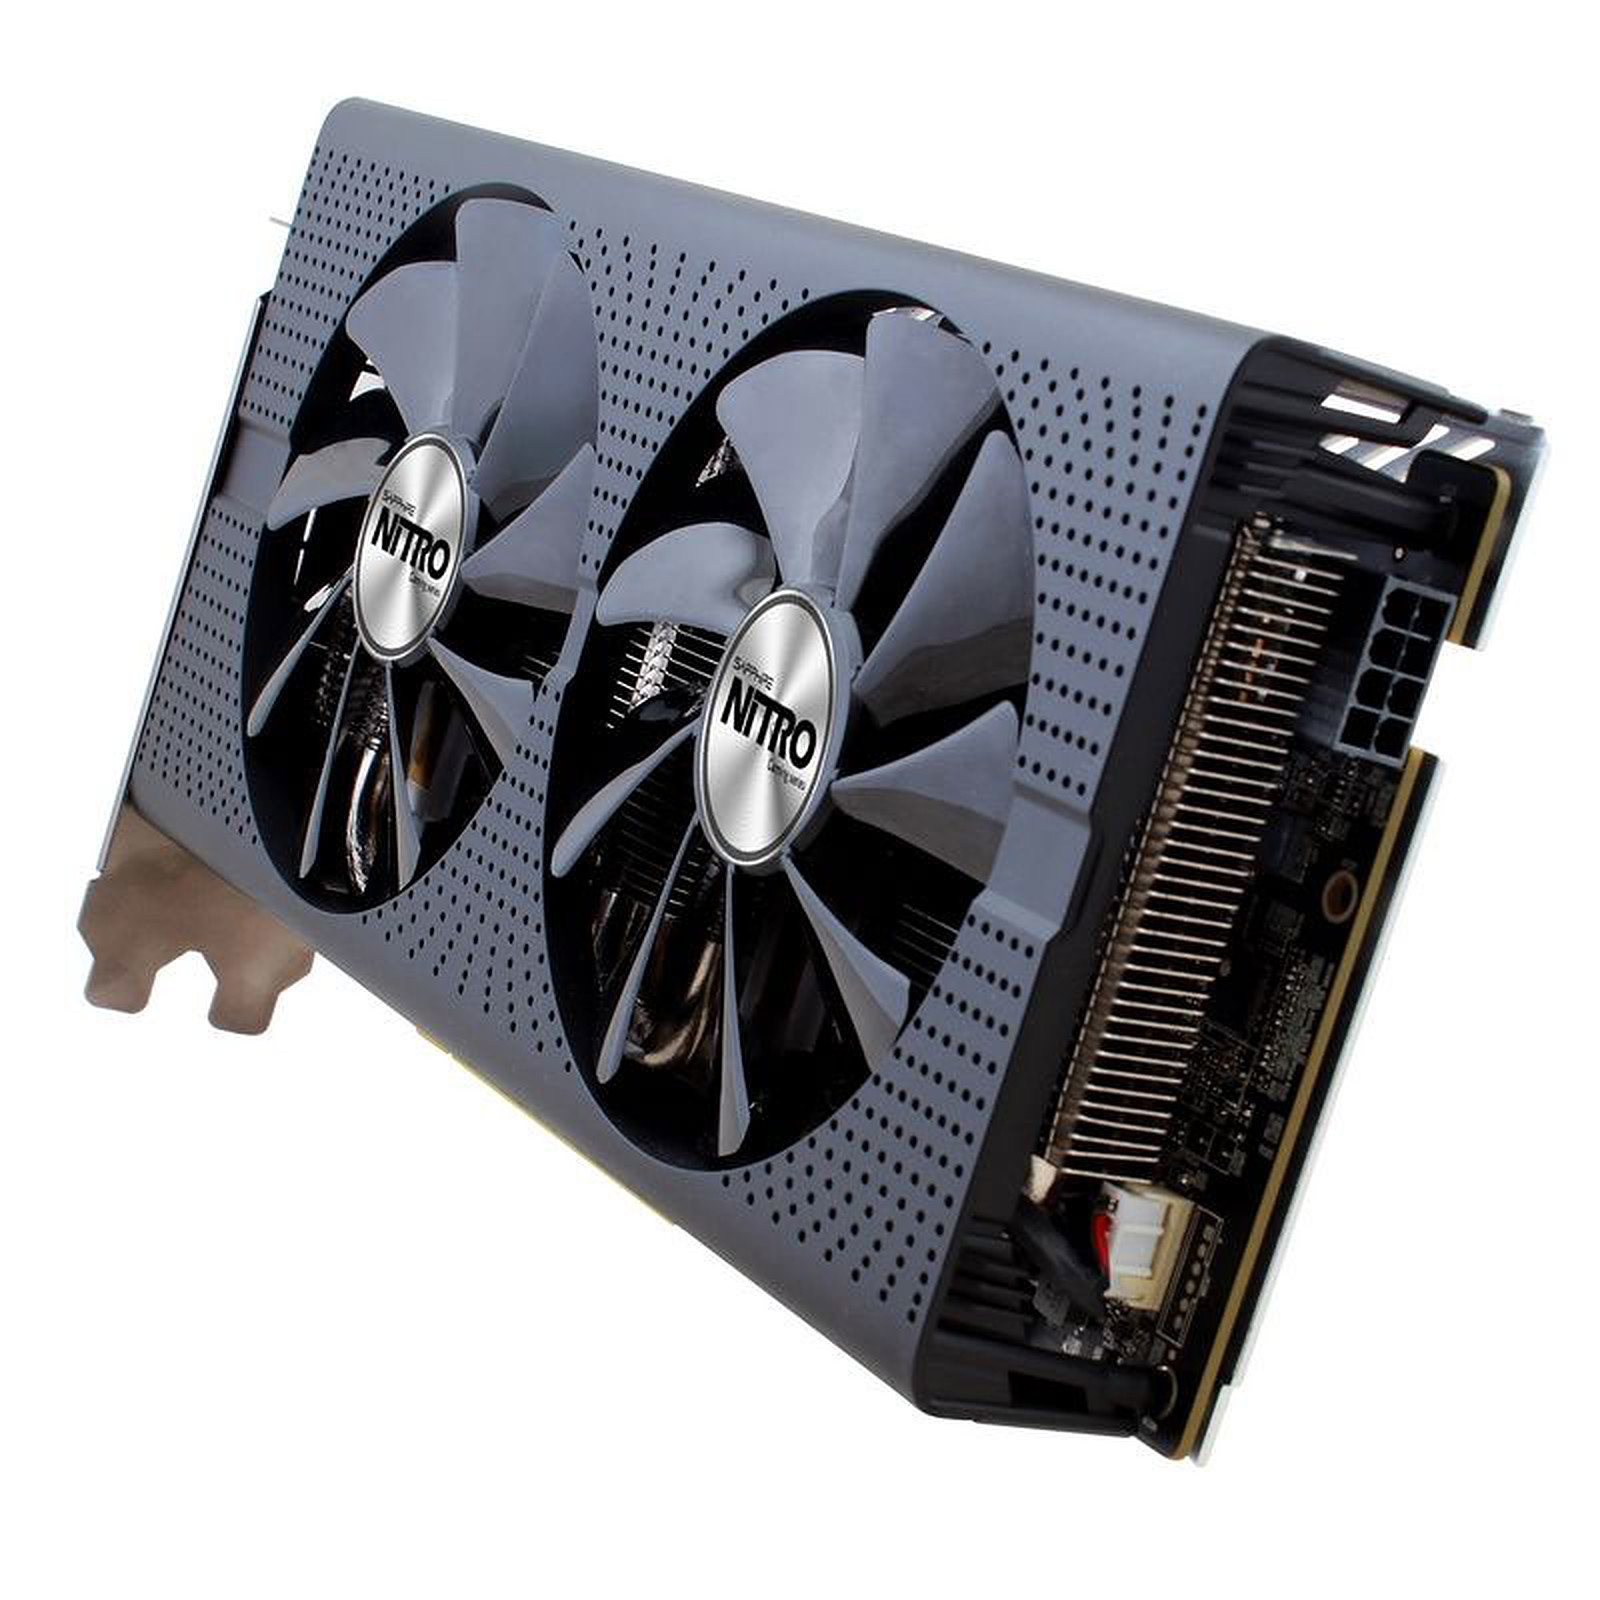 Sapphire Radeon RX 470 4G (GDDR5 Samsung) Mining Edition